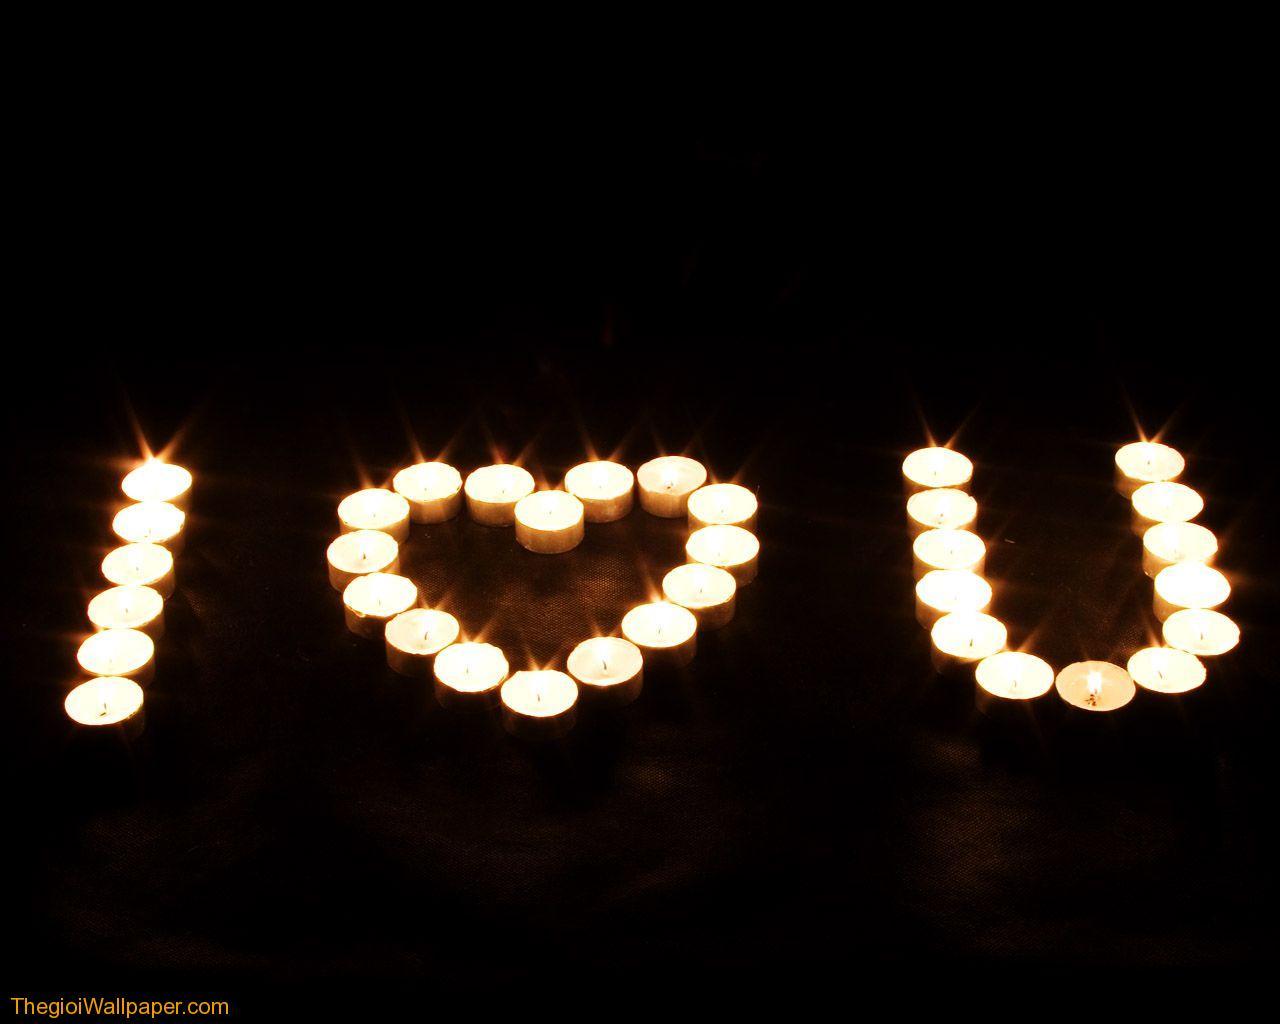 http://4.bp.blogspot.com/_Fu6Sd9n2_GE/TPJDuS2aVOI/AAAAAAAAAW8/qBEVyrbyi-w/s1600/love-wallpaper-5-1.jpeg